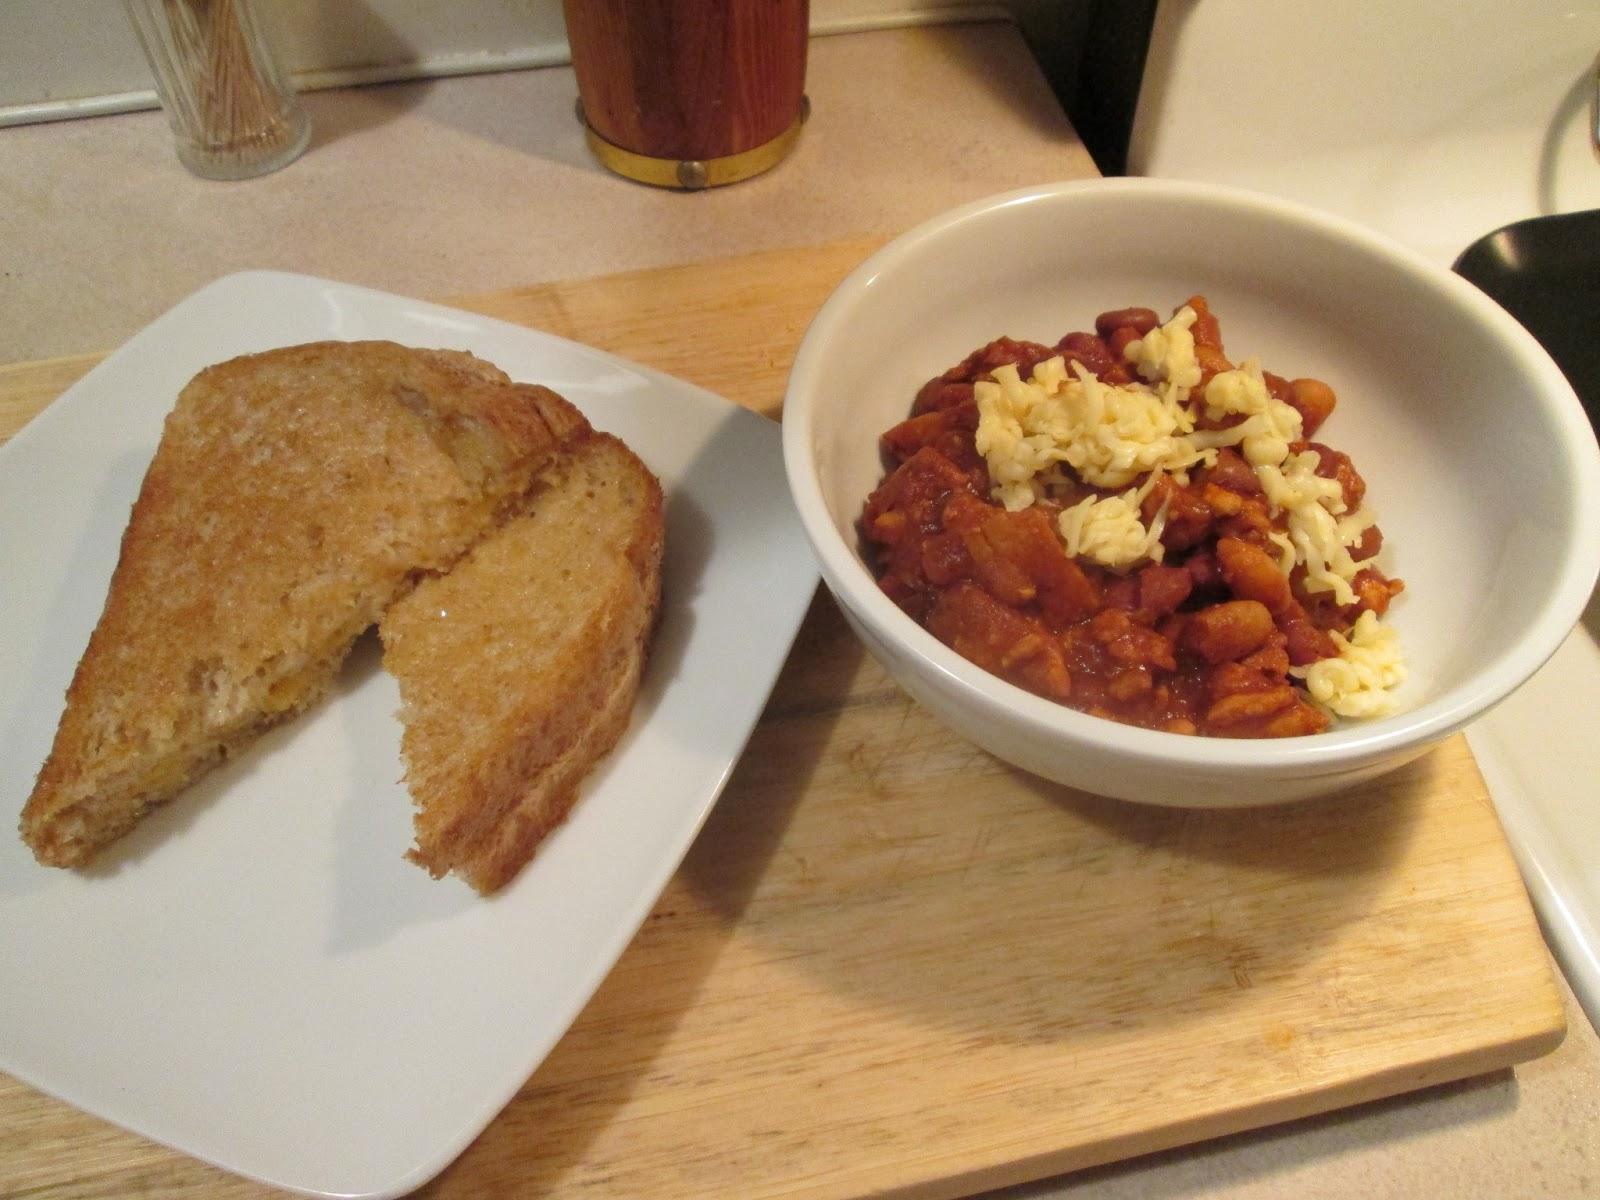 Diab2Cook: 3 Bean Turkey Chili w/ Grilled Cheese Sandwich